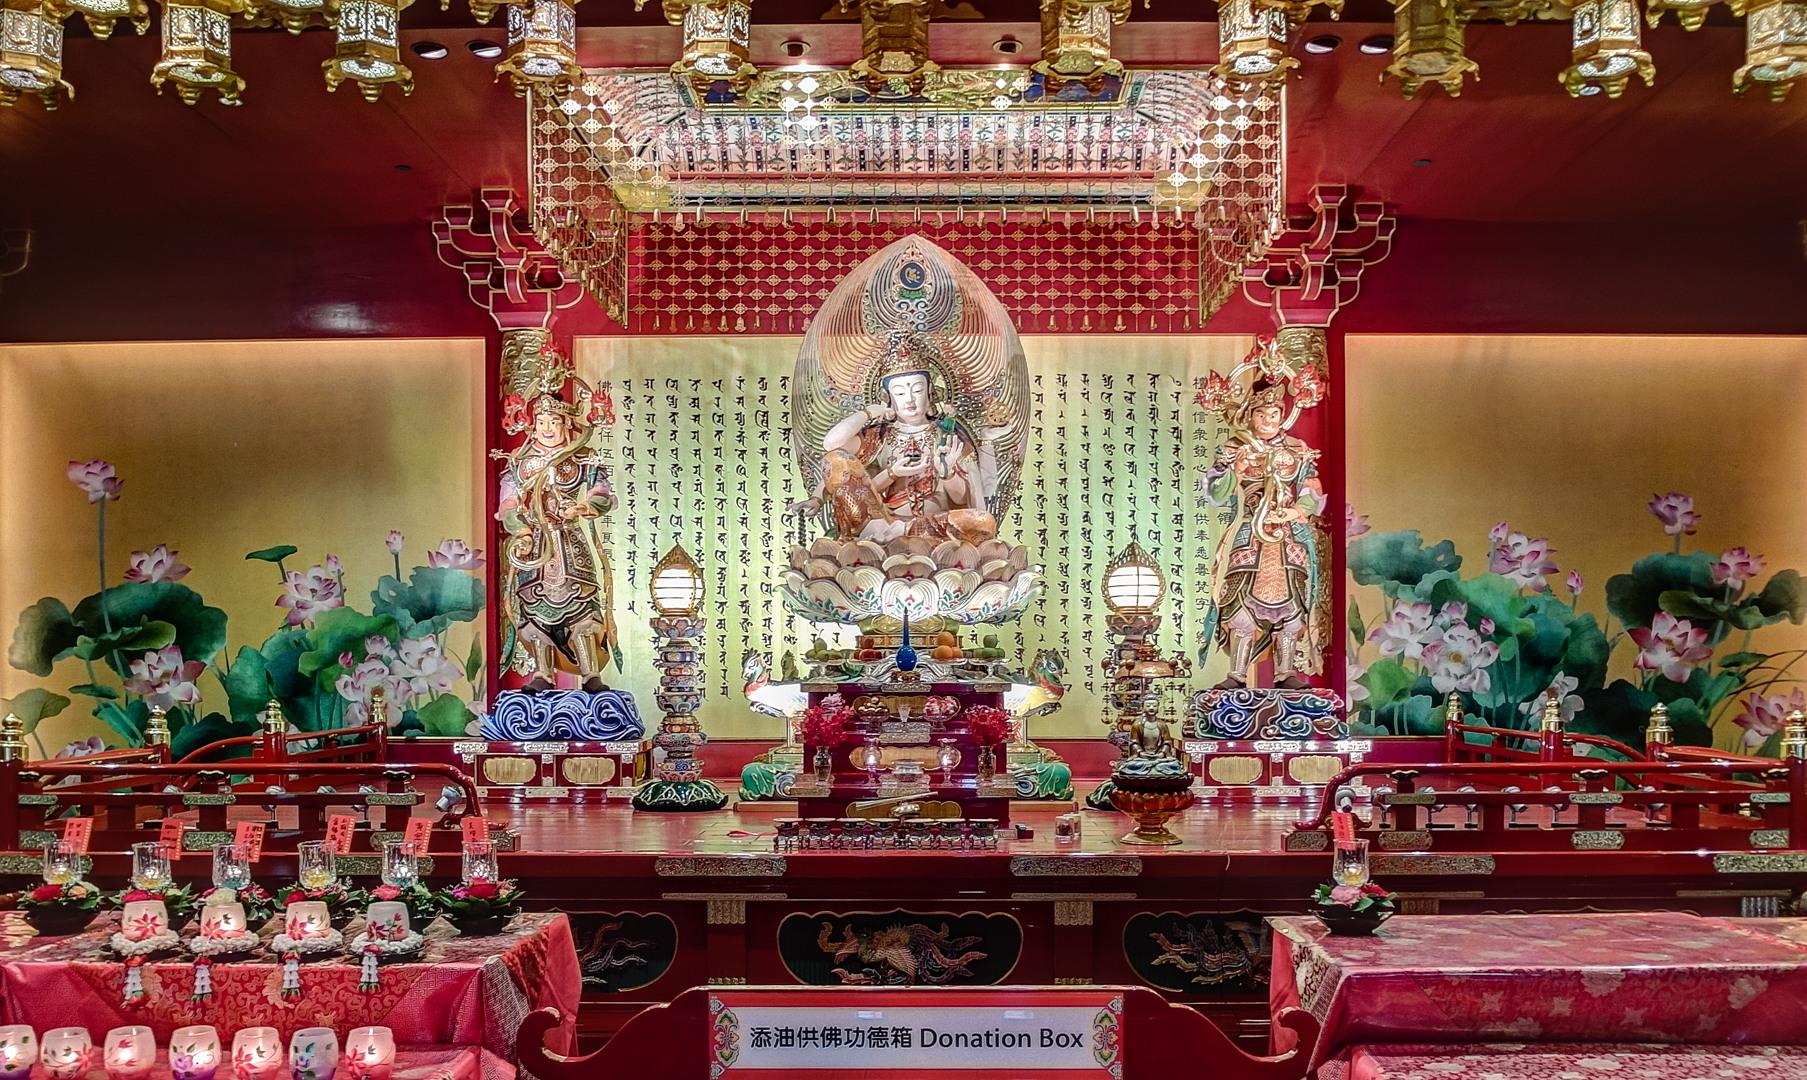 Буддийский храм музей Temple bell Buddha Tooth Relic Temple and Museum, Сингапур